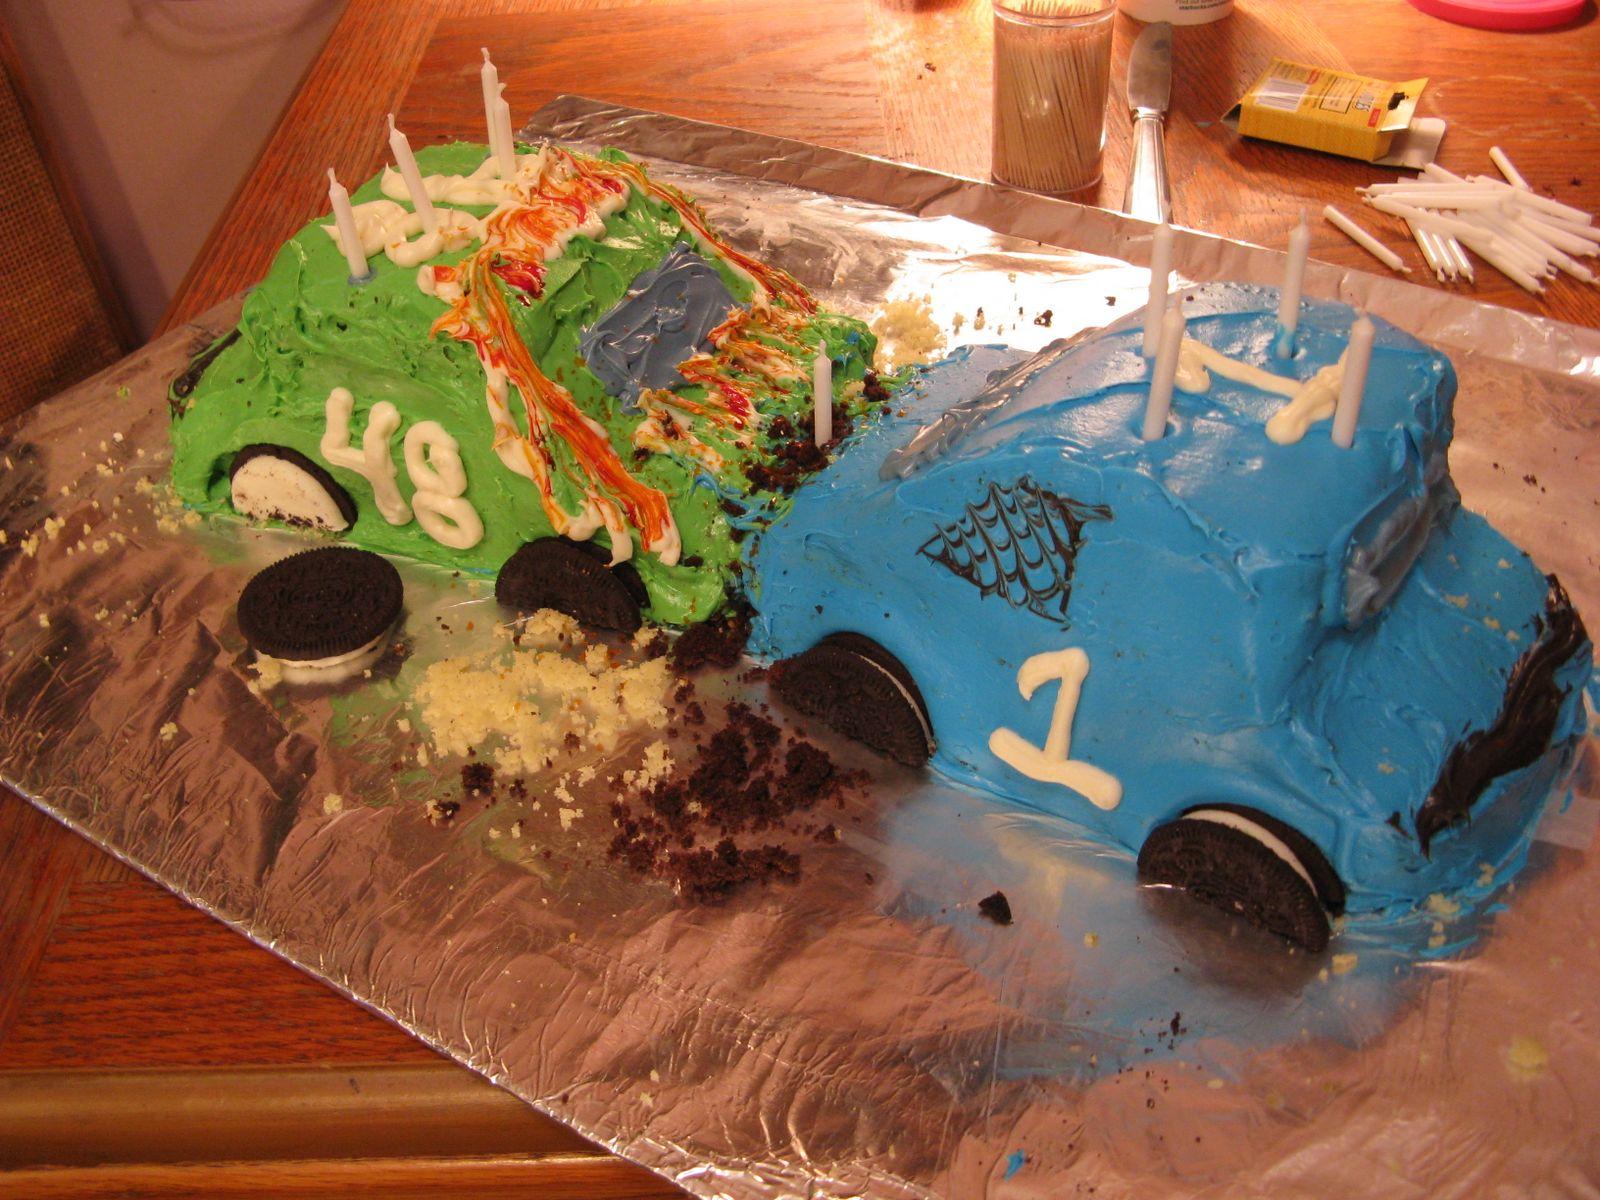 Victorious Cakes Dallas Birthday Cake 2009